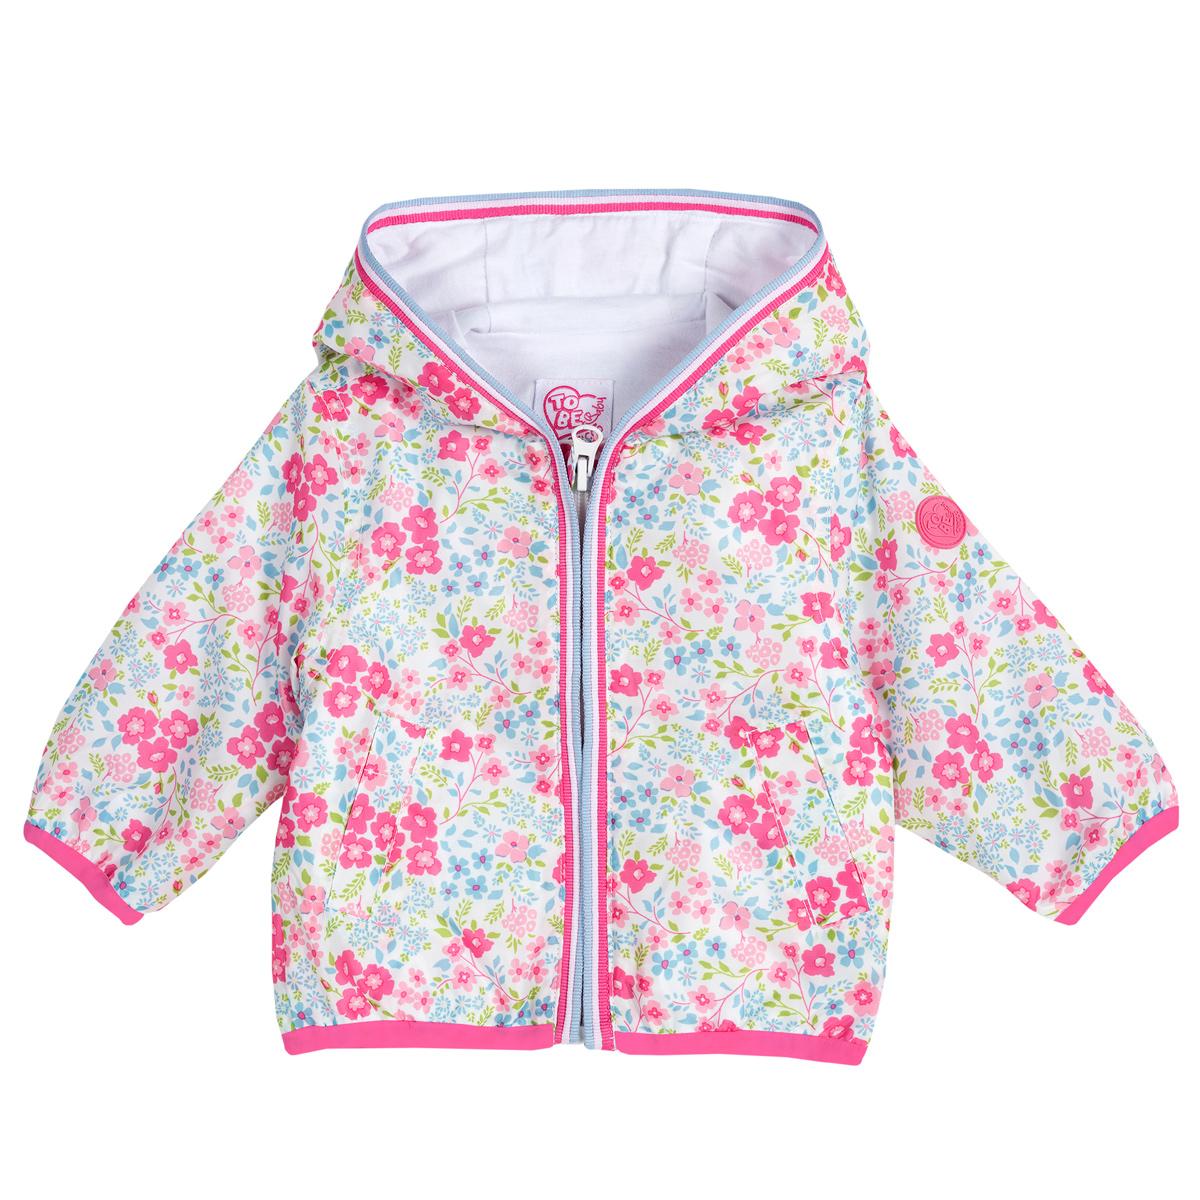 Jacheta copii Chicco, roz cu trandafir, 87379 din categoria Jachete copii